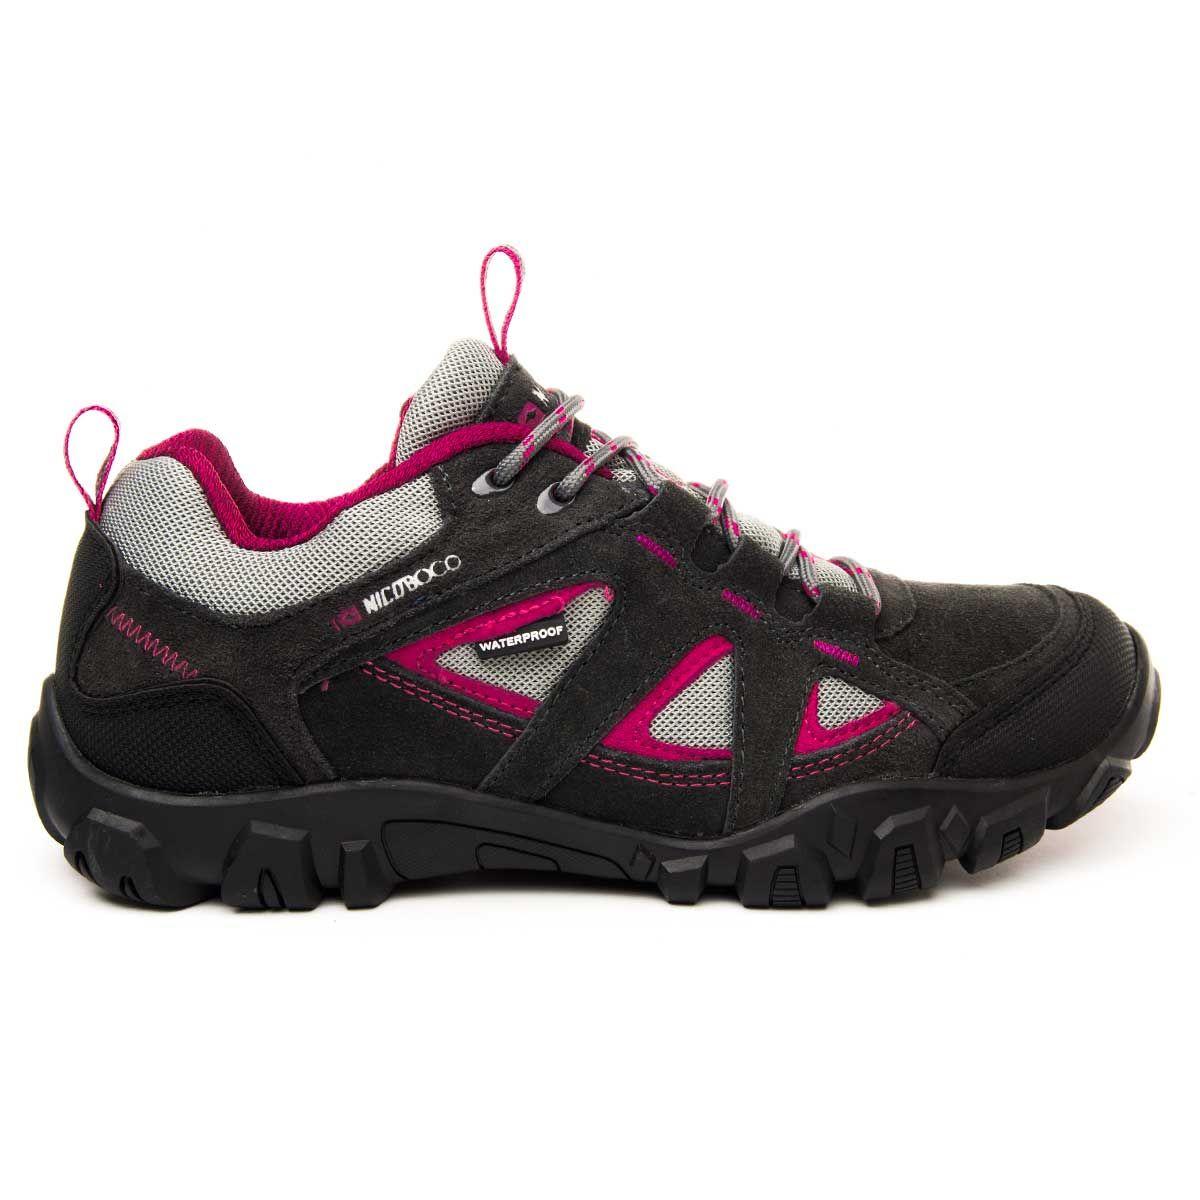 Montevita Sneaker in Fuchsia